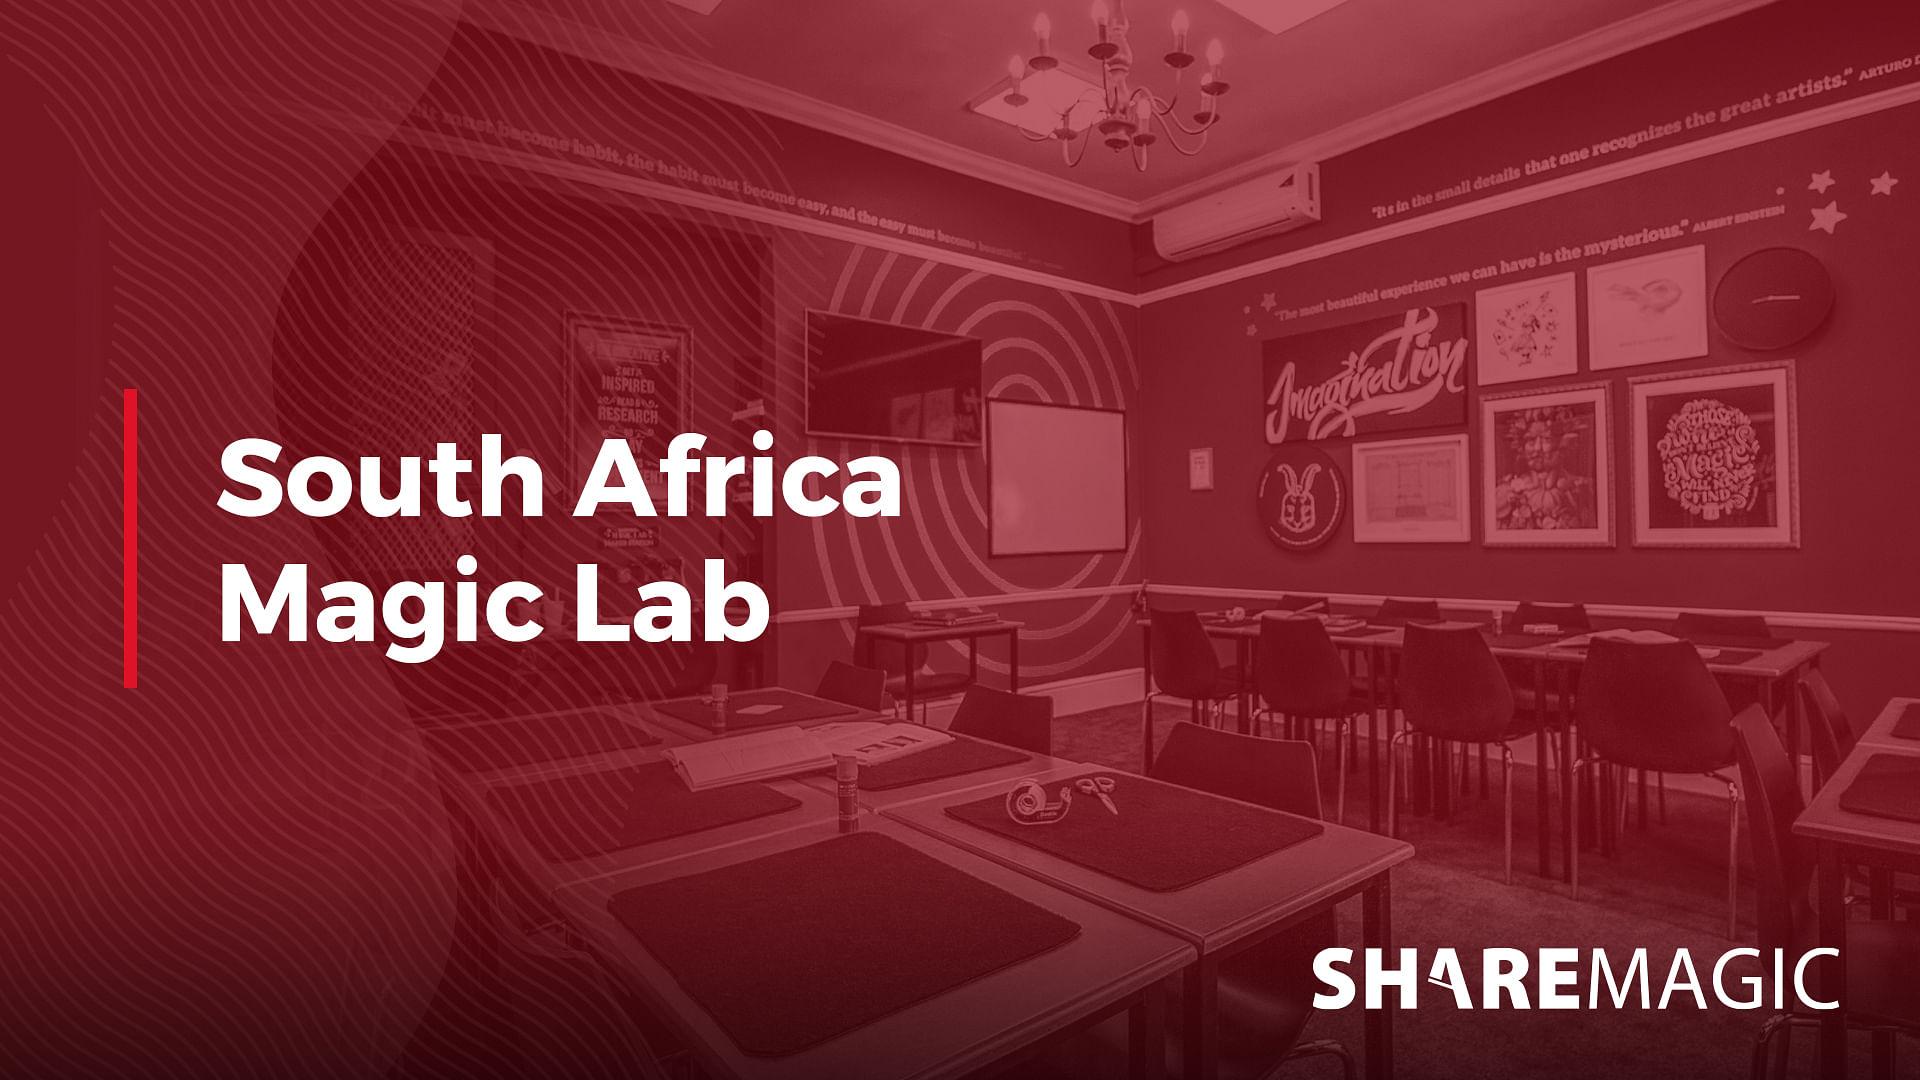 South Africa Magic Lab